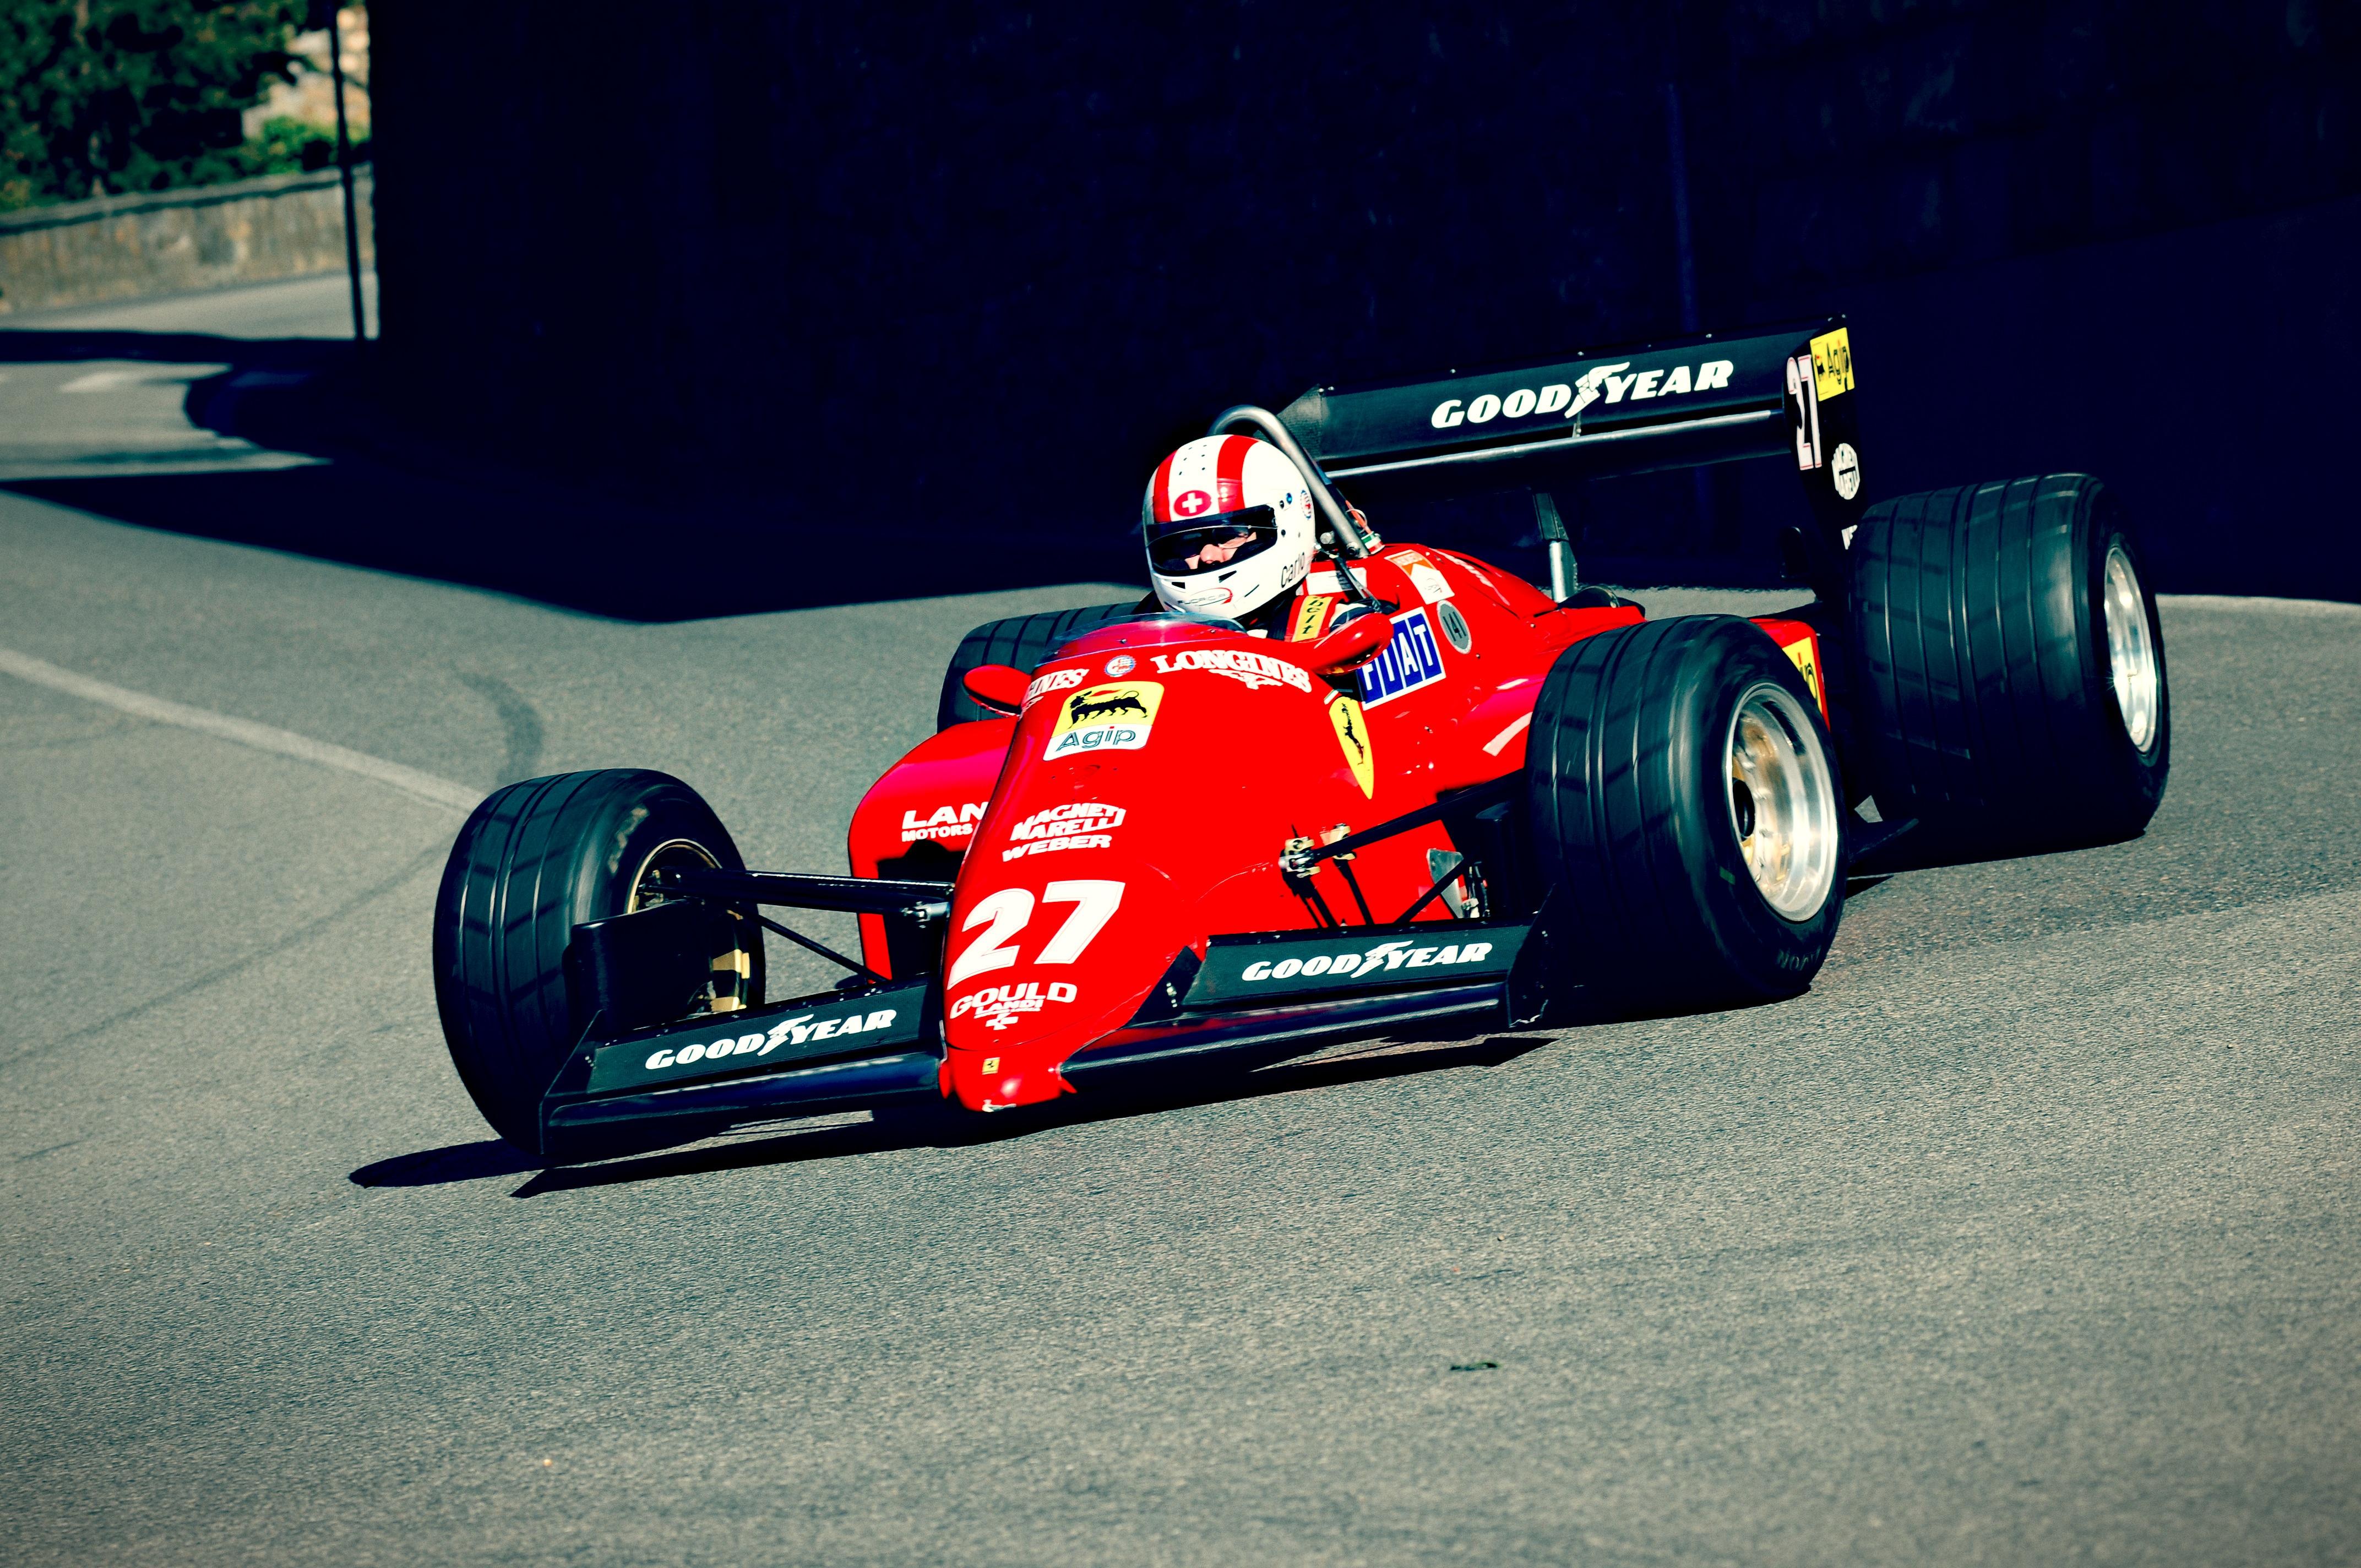 Classic #f1 Car For Sale - 1984 Ferrari 126 C4/M2 - Retro Race Cars